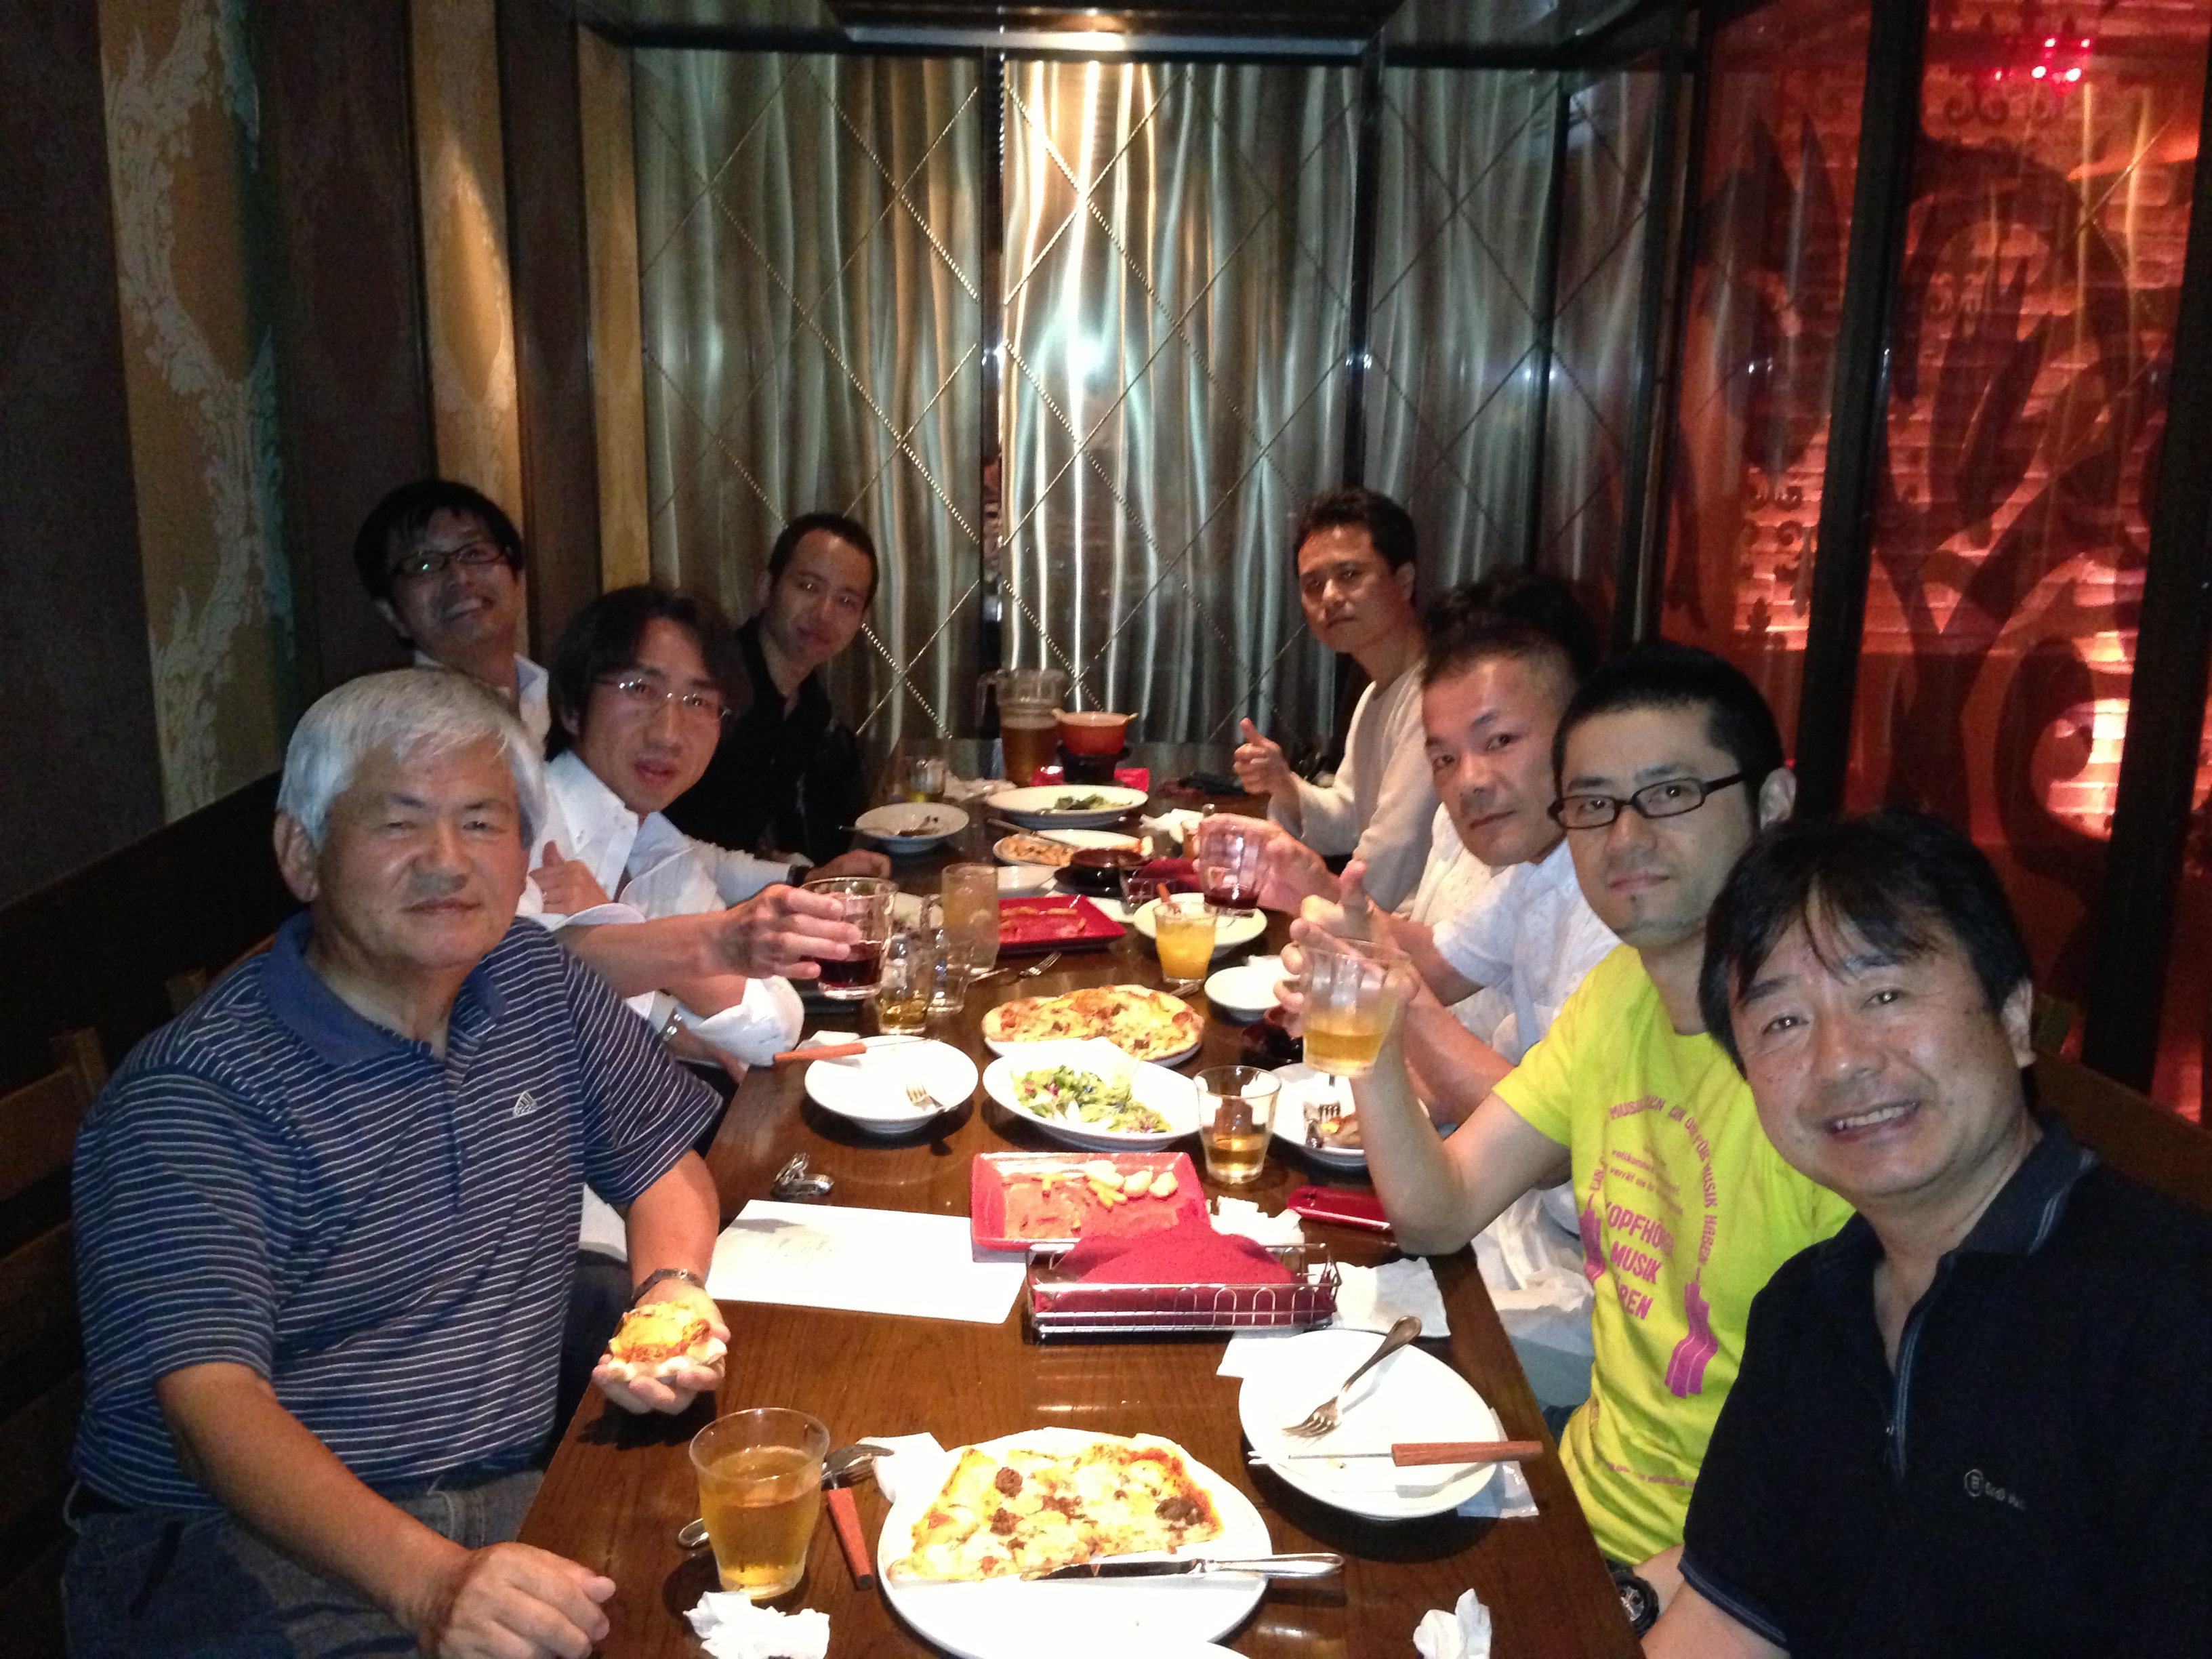 AWBM塾・第1期・3回目懇親会@渋谷の様子